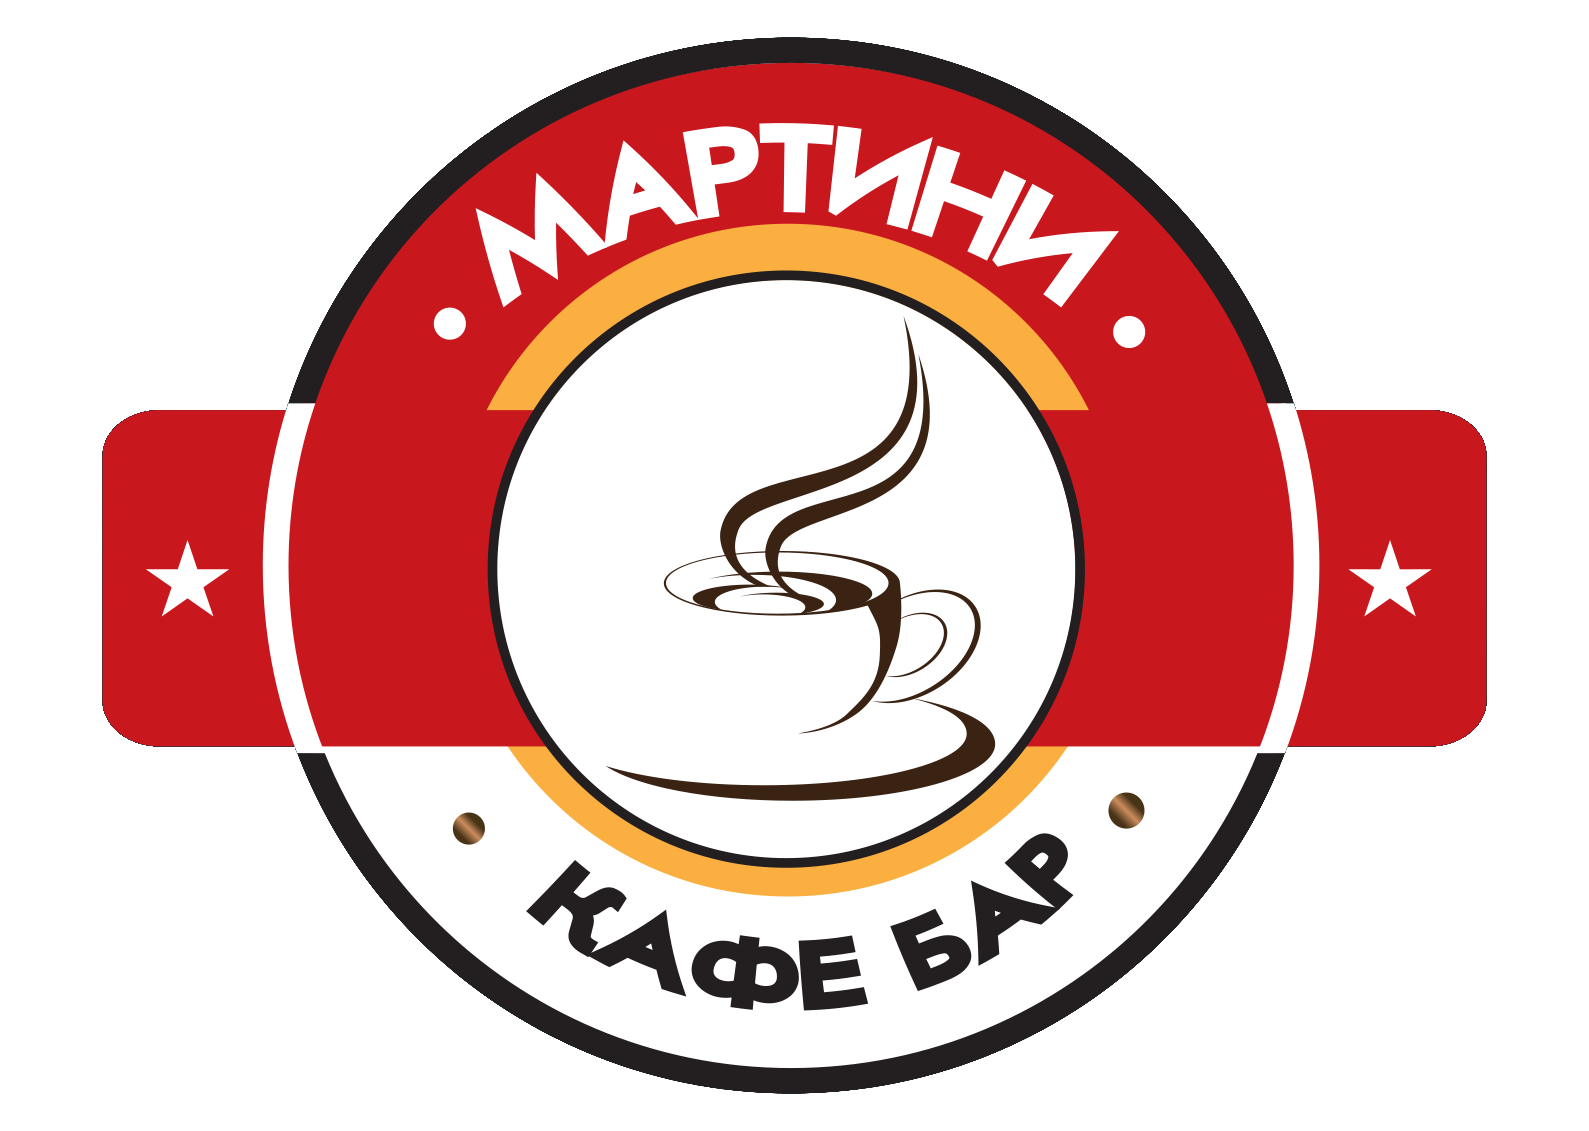 Martini Caffe